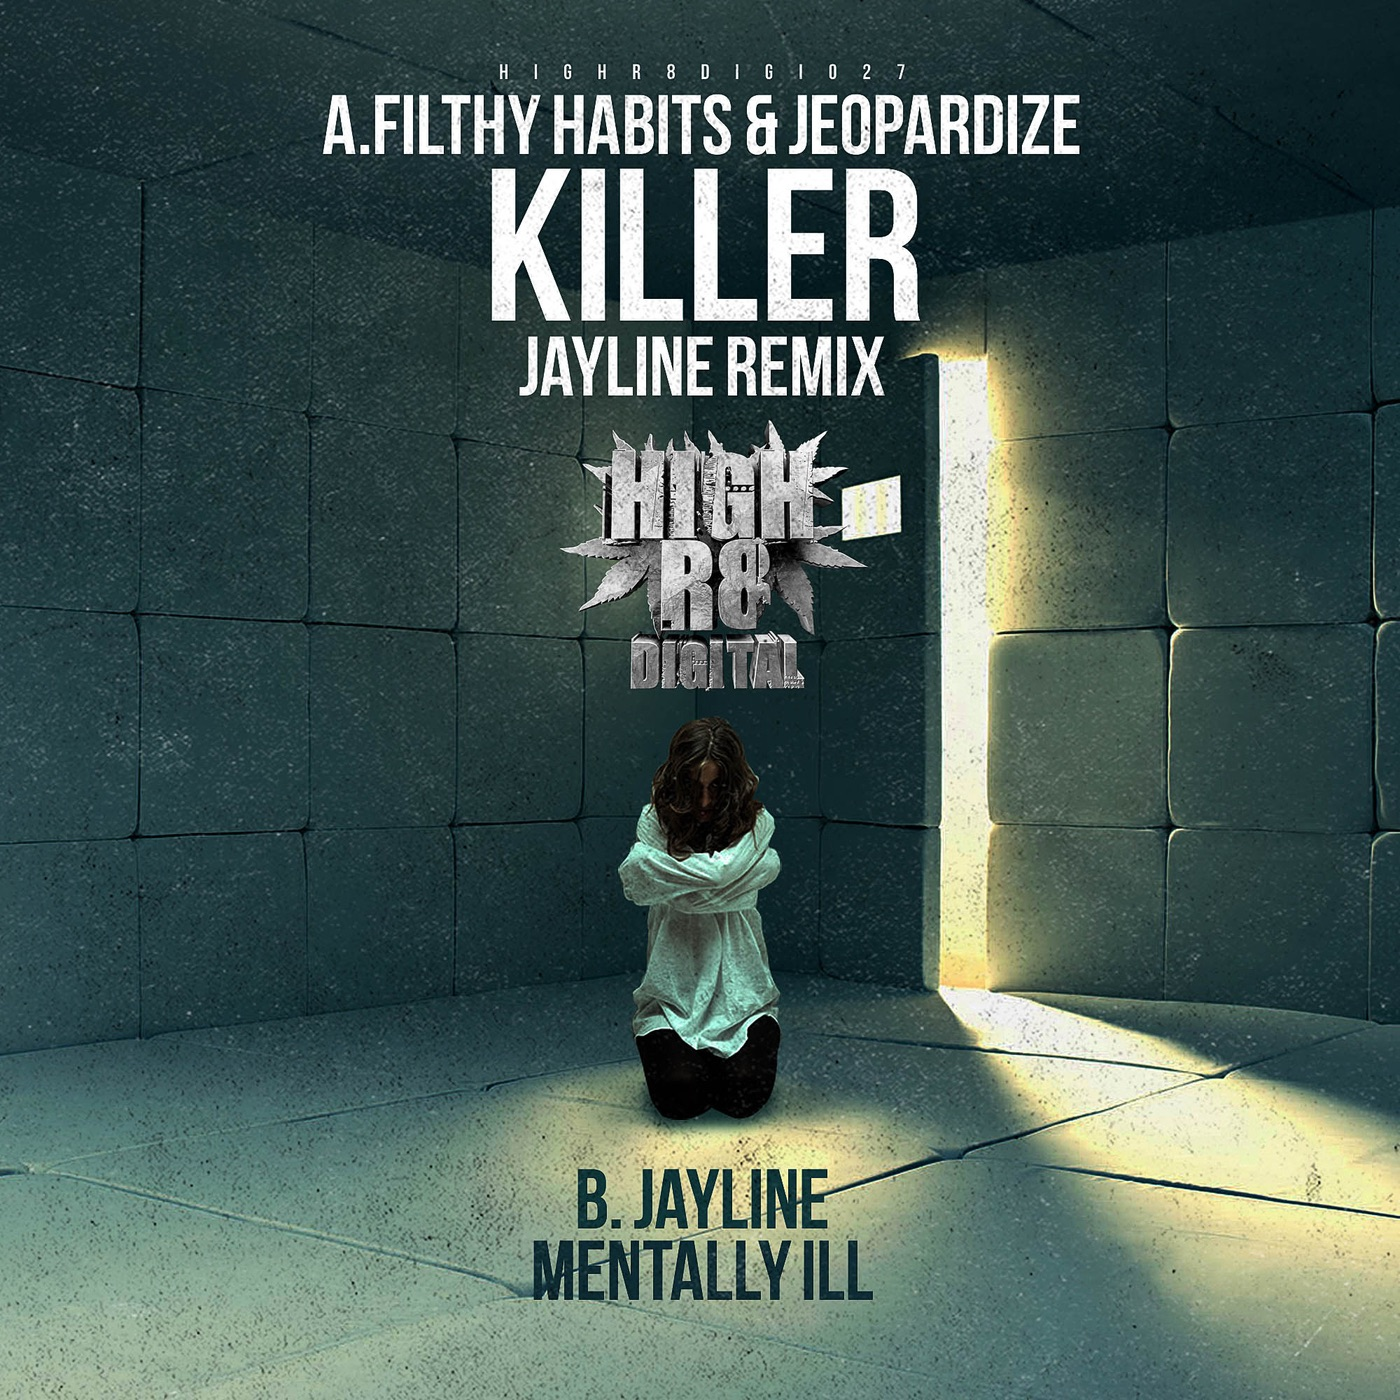 Killer (Jayline Remix)